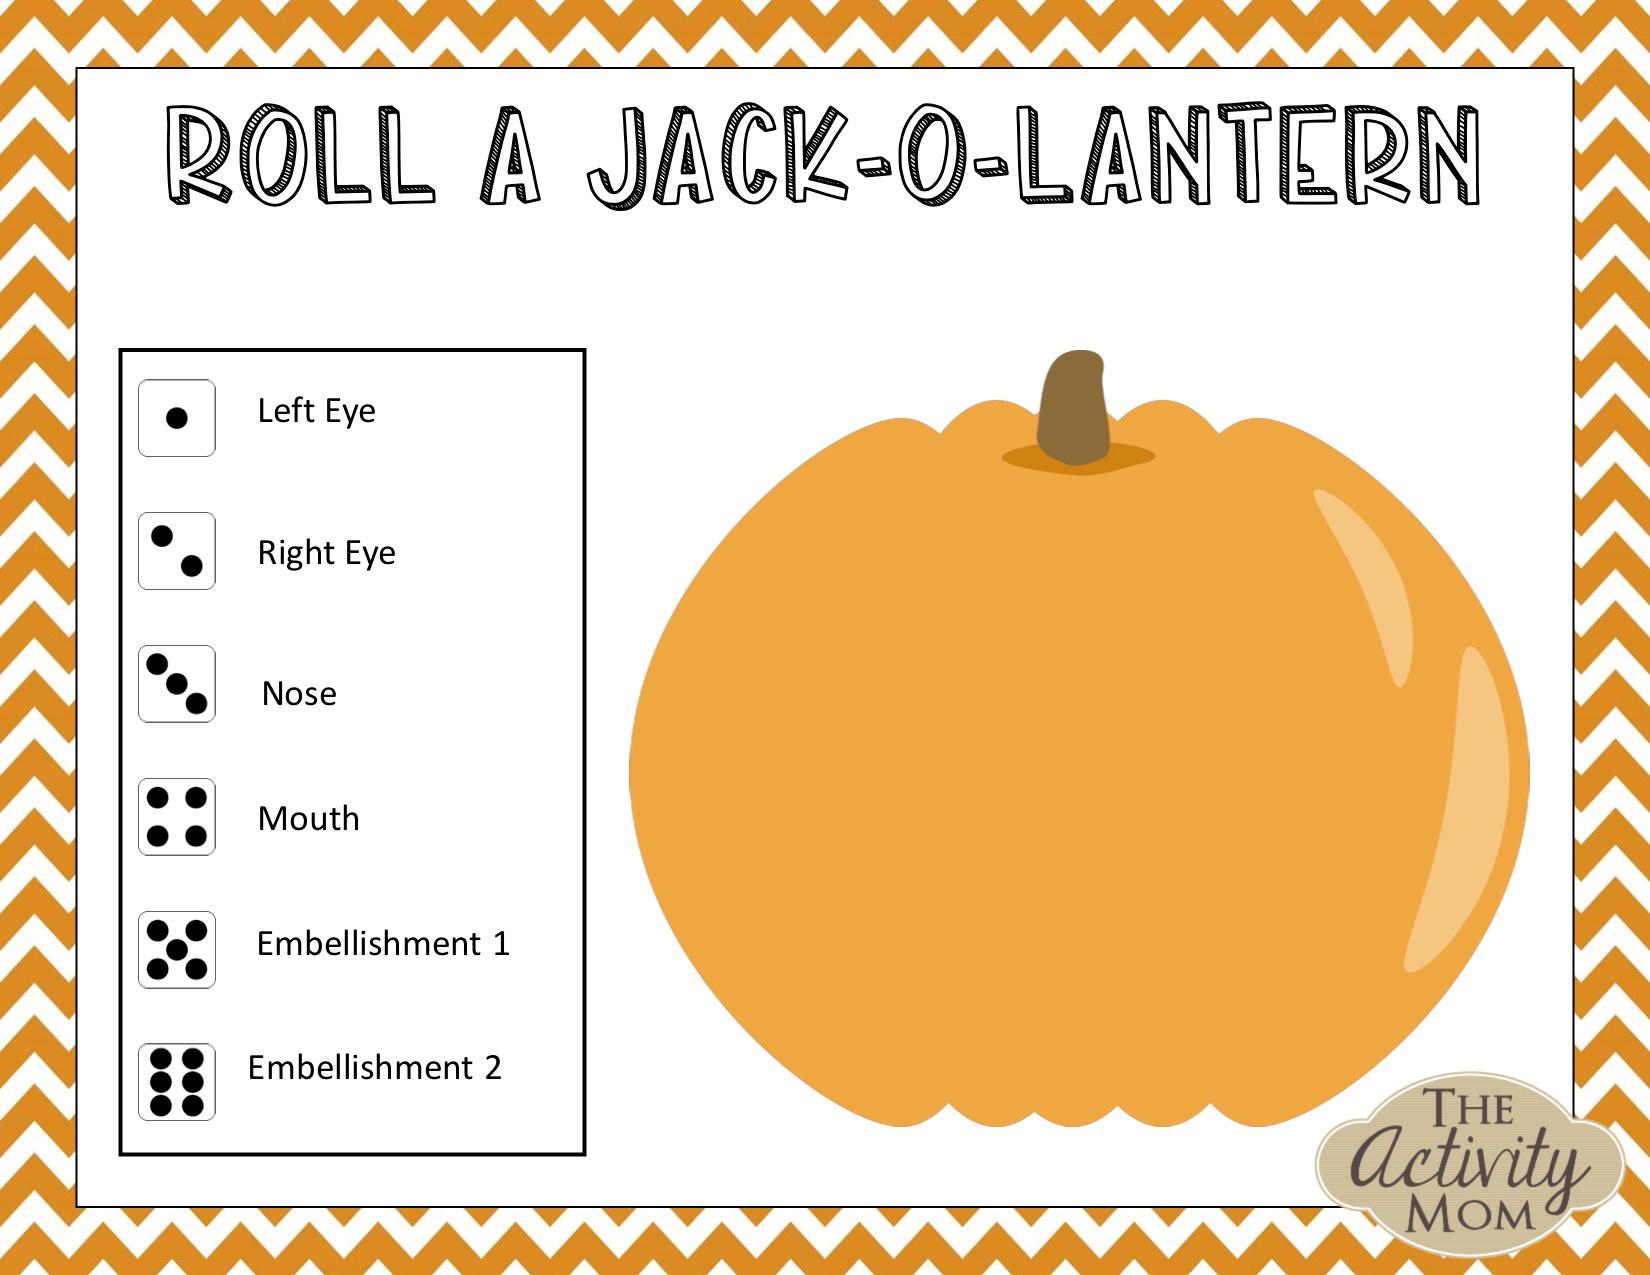 Roll a Jack-O-Lantern Game